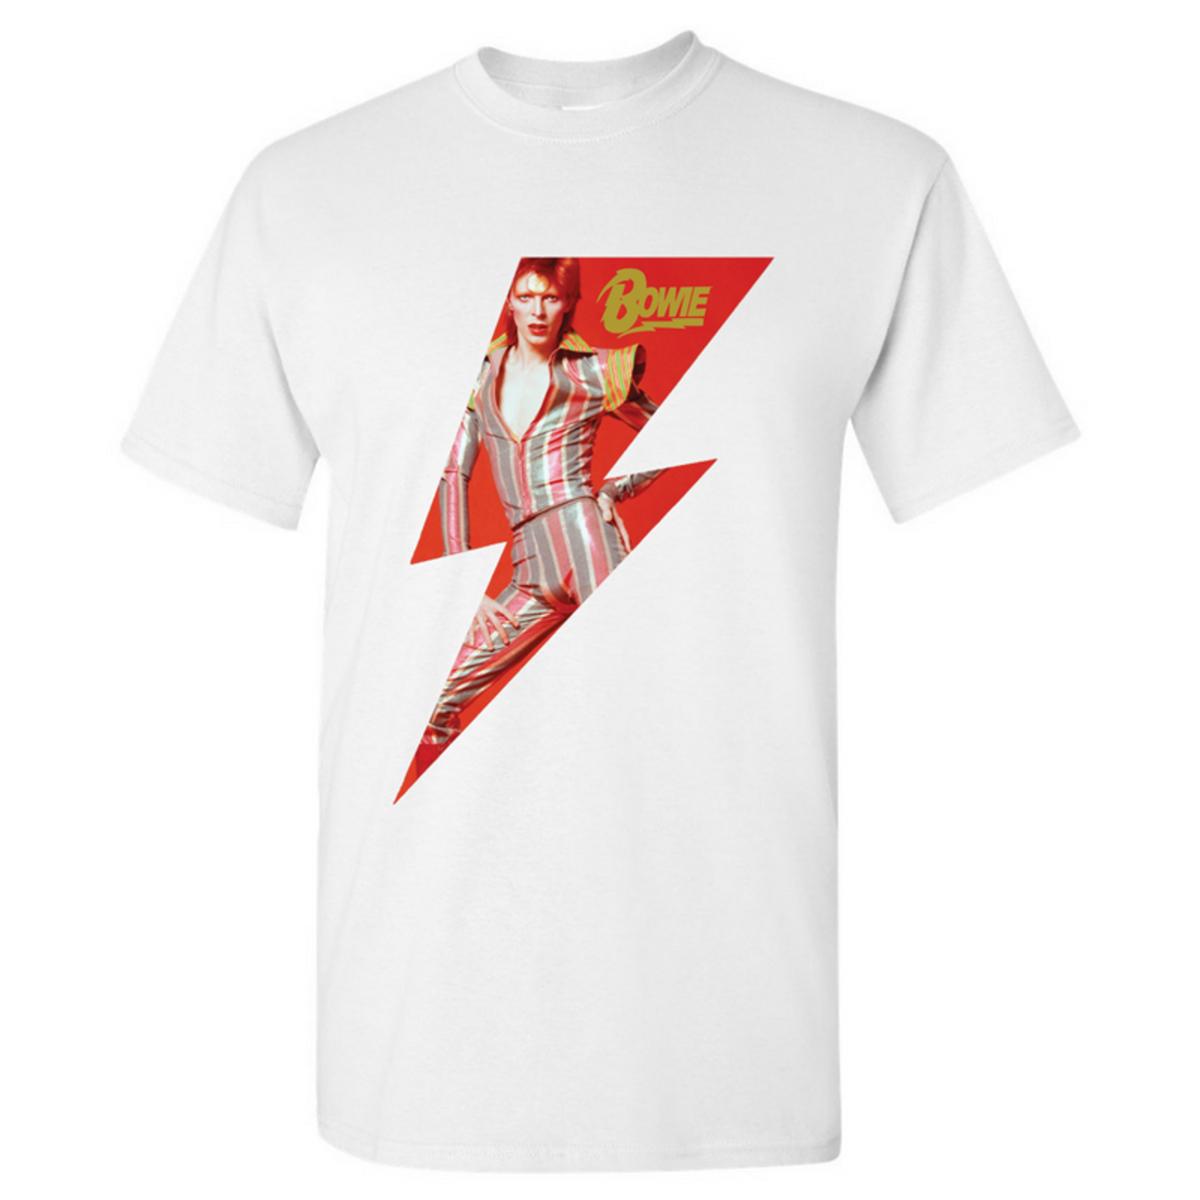 Spaced Lightning T-Shirt